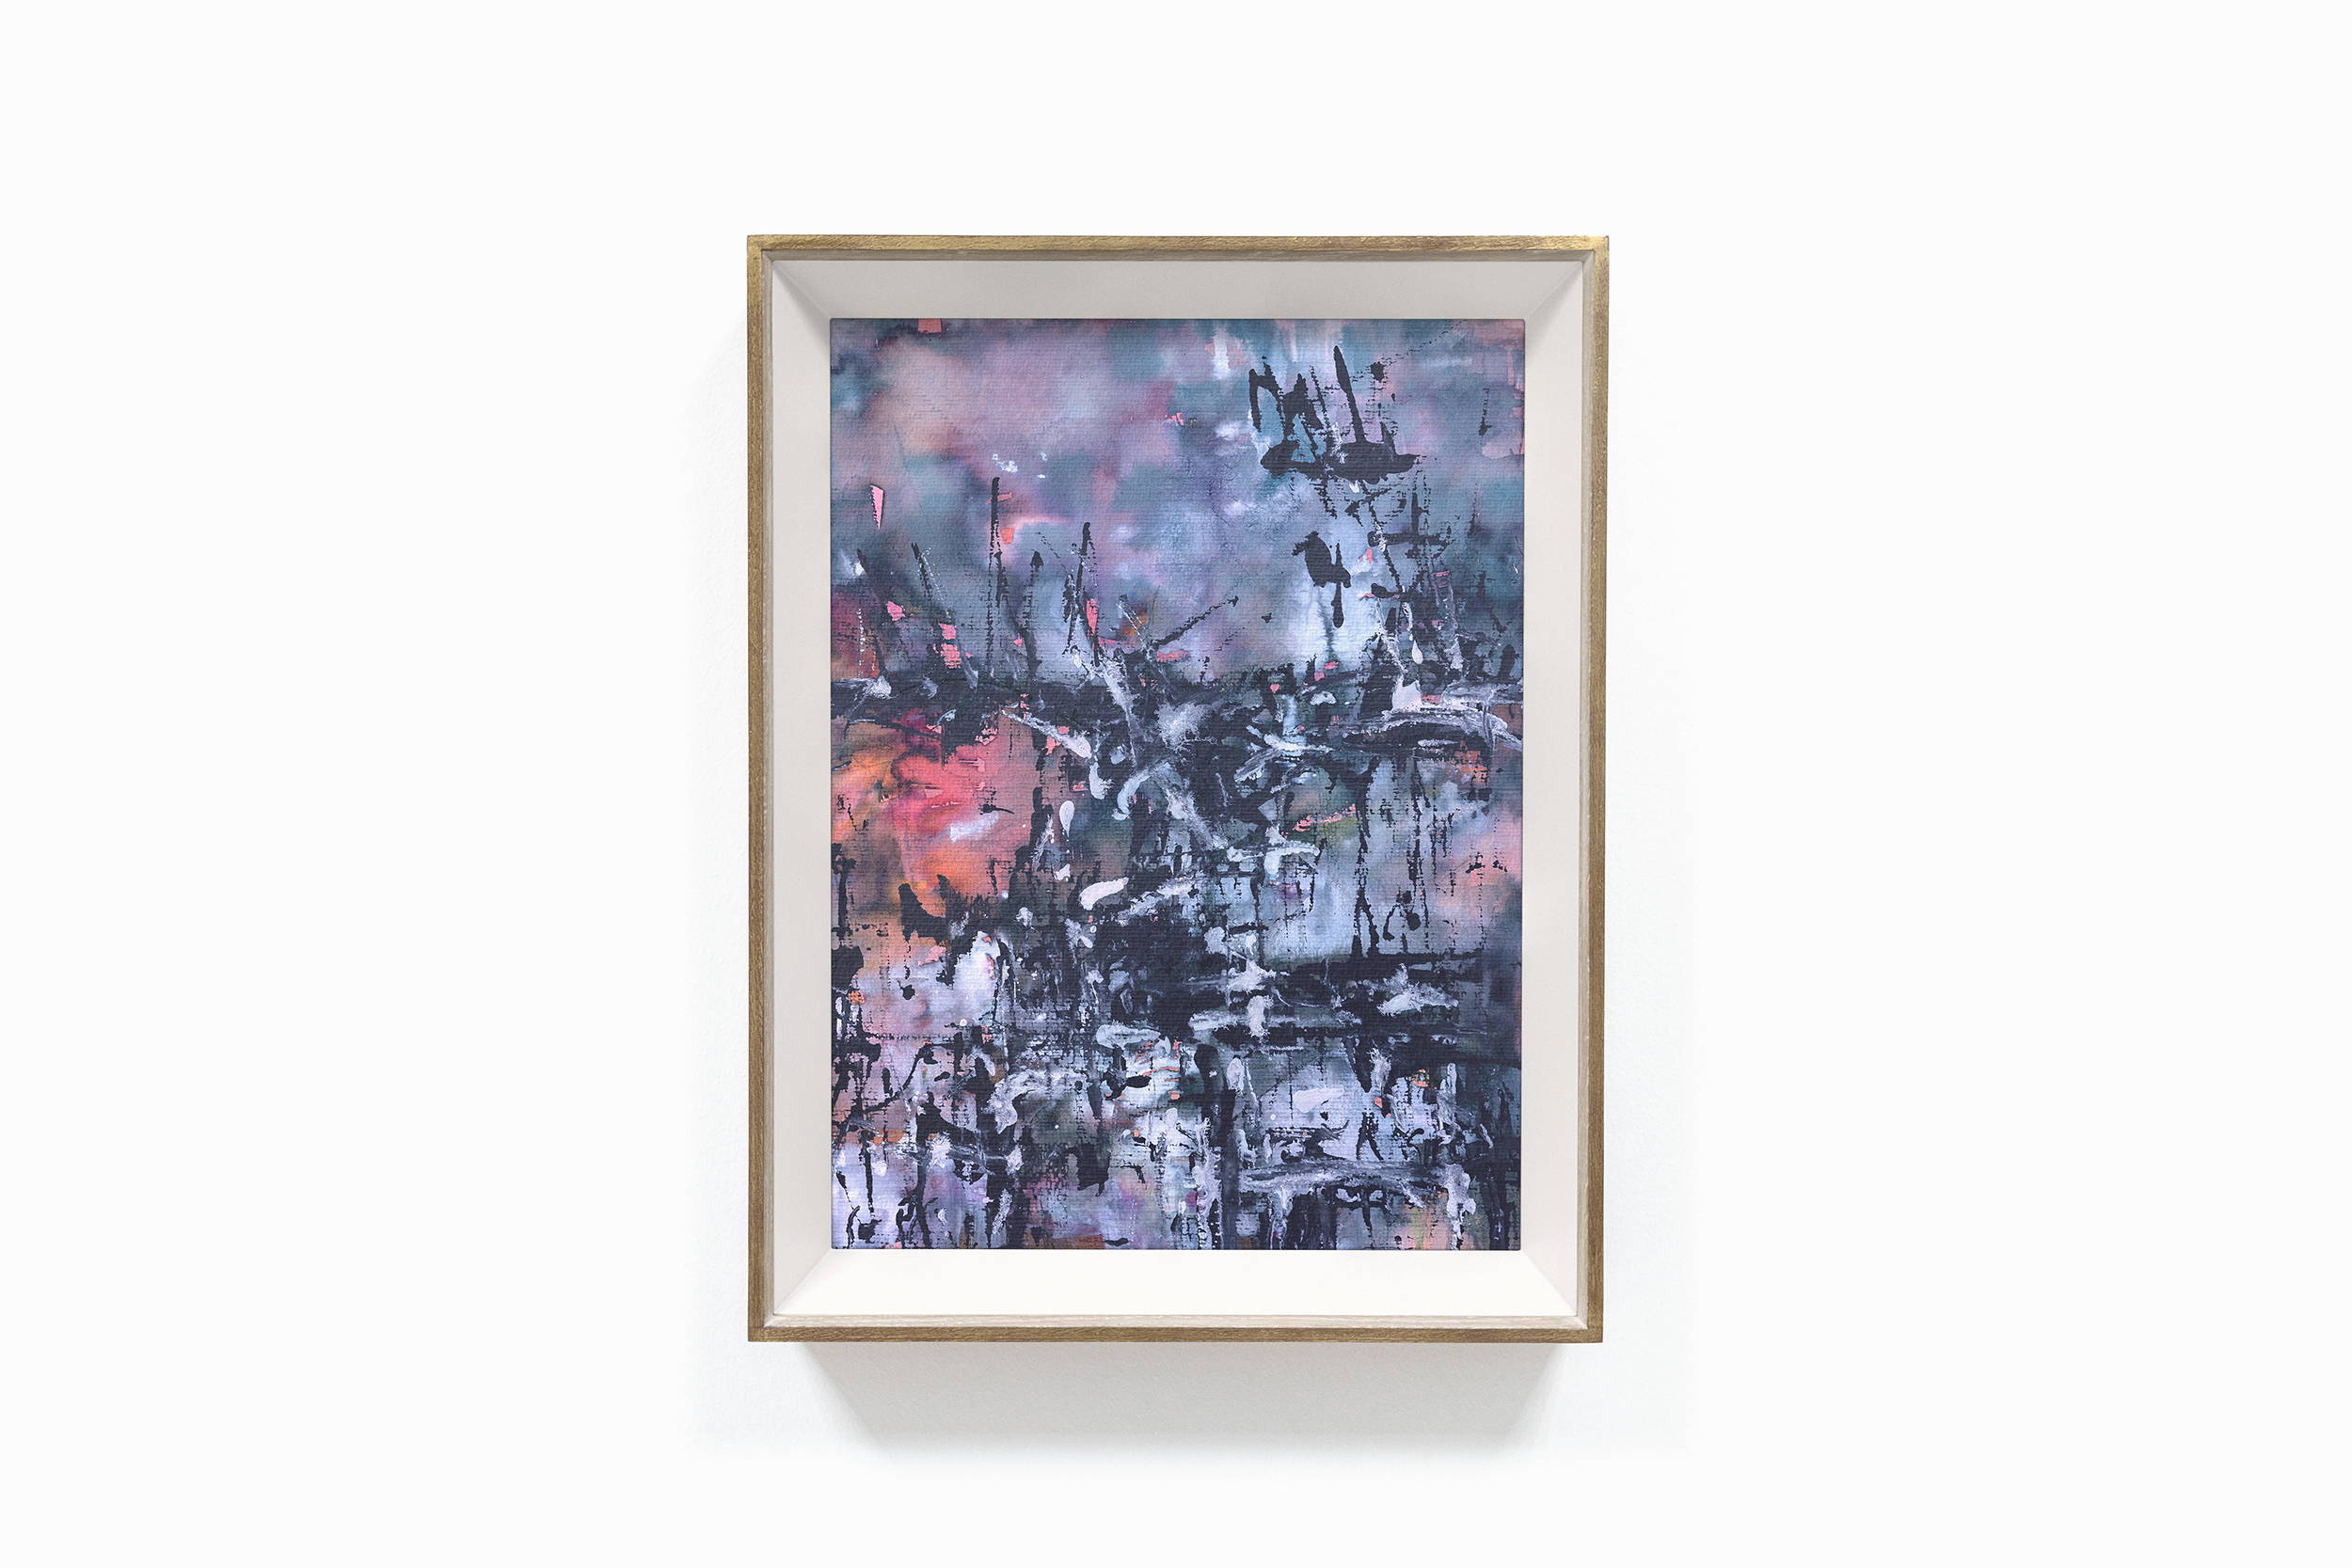 bonjourmolotov+Faded+stories+Illustration+Ilustracao+painting+pintura+acrylic+acrílico+canvas+tela+paper+cardboard+mdf+Andre+Gigante+06N8.jpg